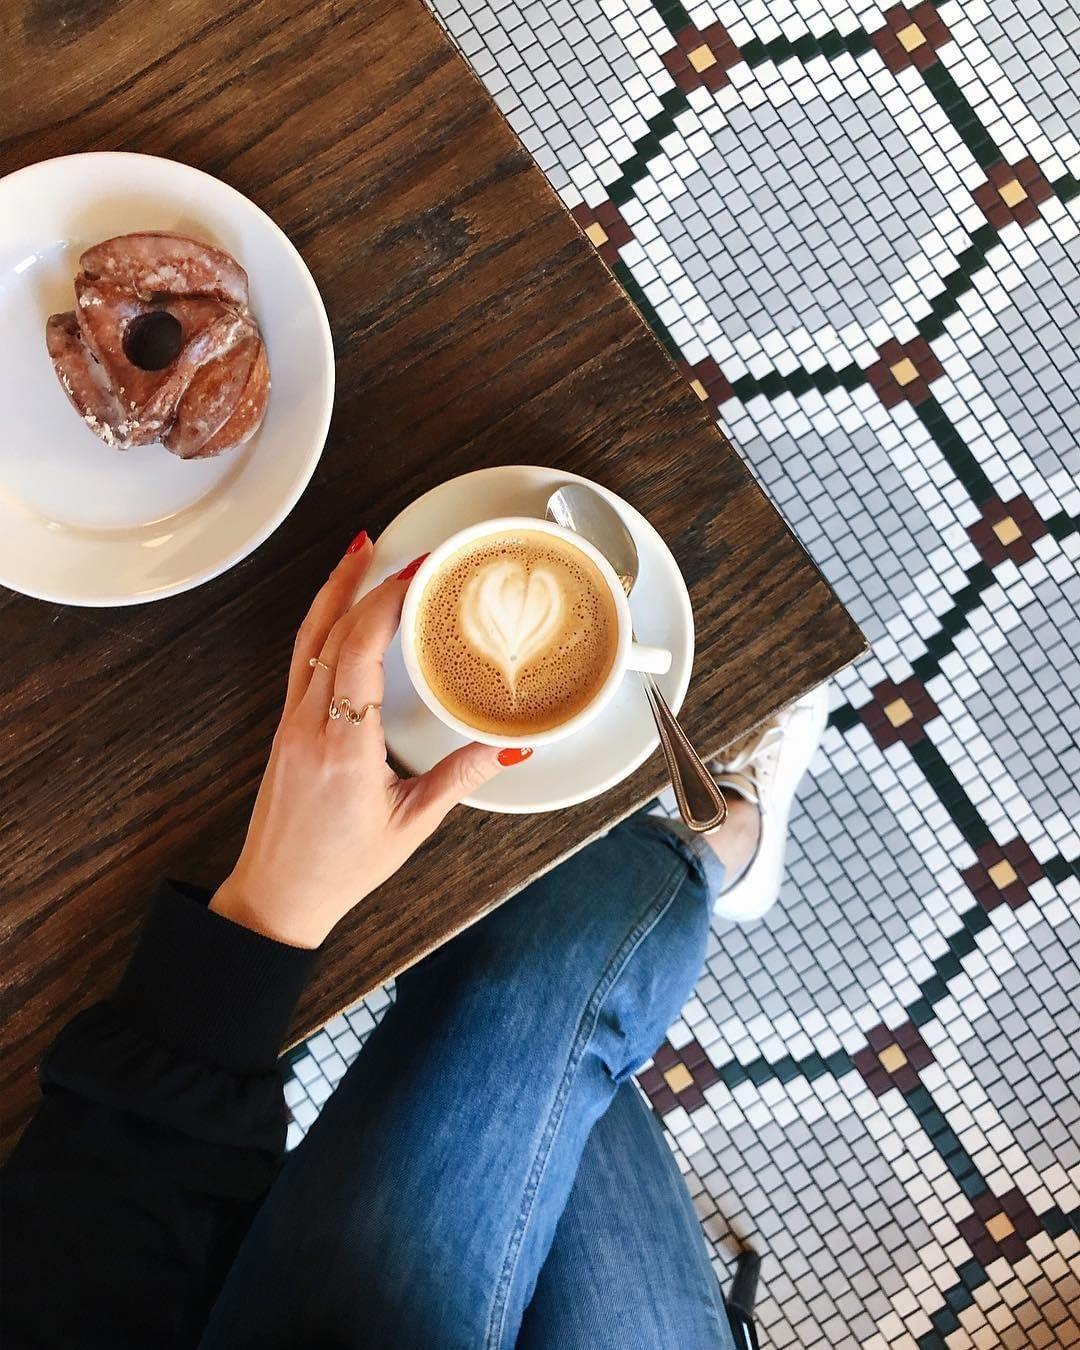 Pin By Sena On Art Cappuccino Coffee Coffee Lover Coffee Photography Coffee Cafe